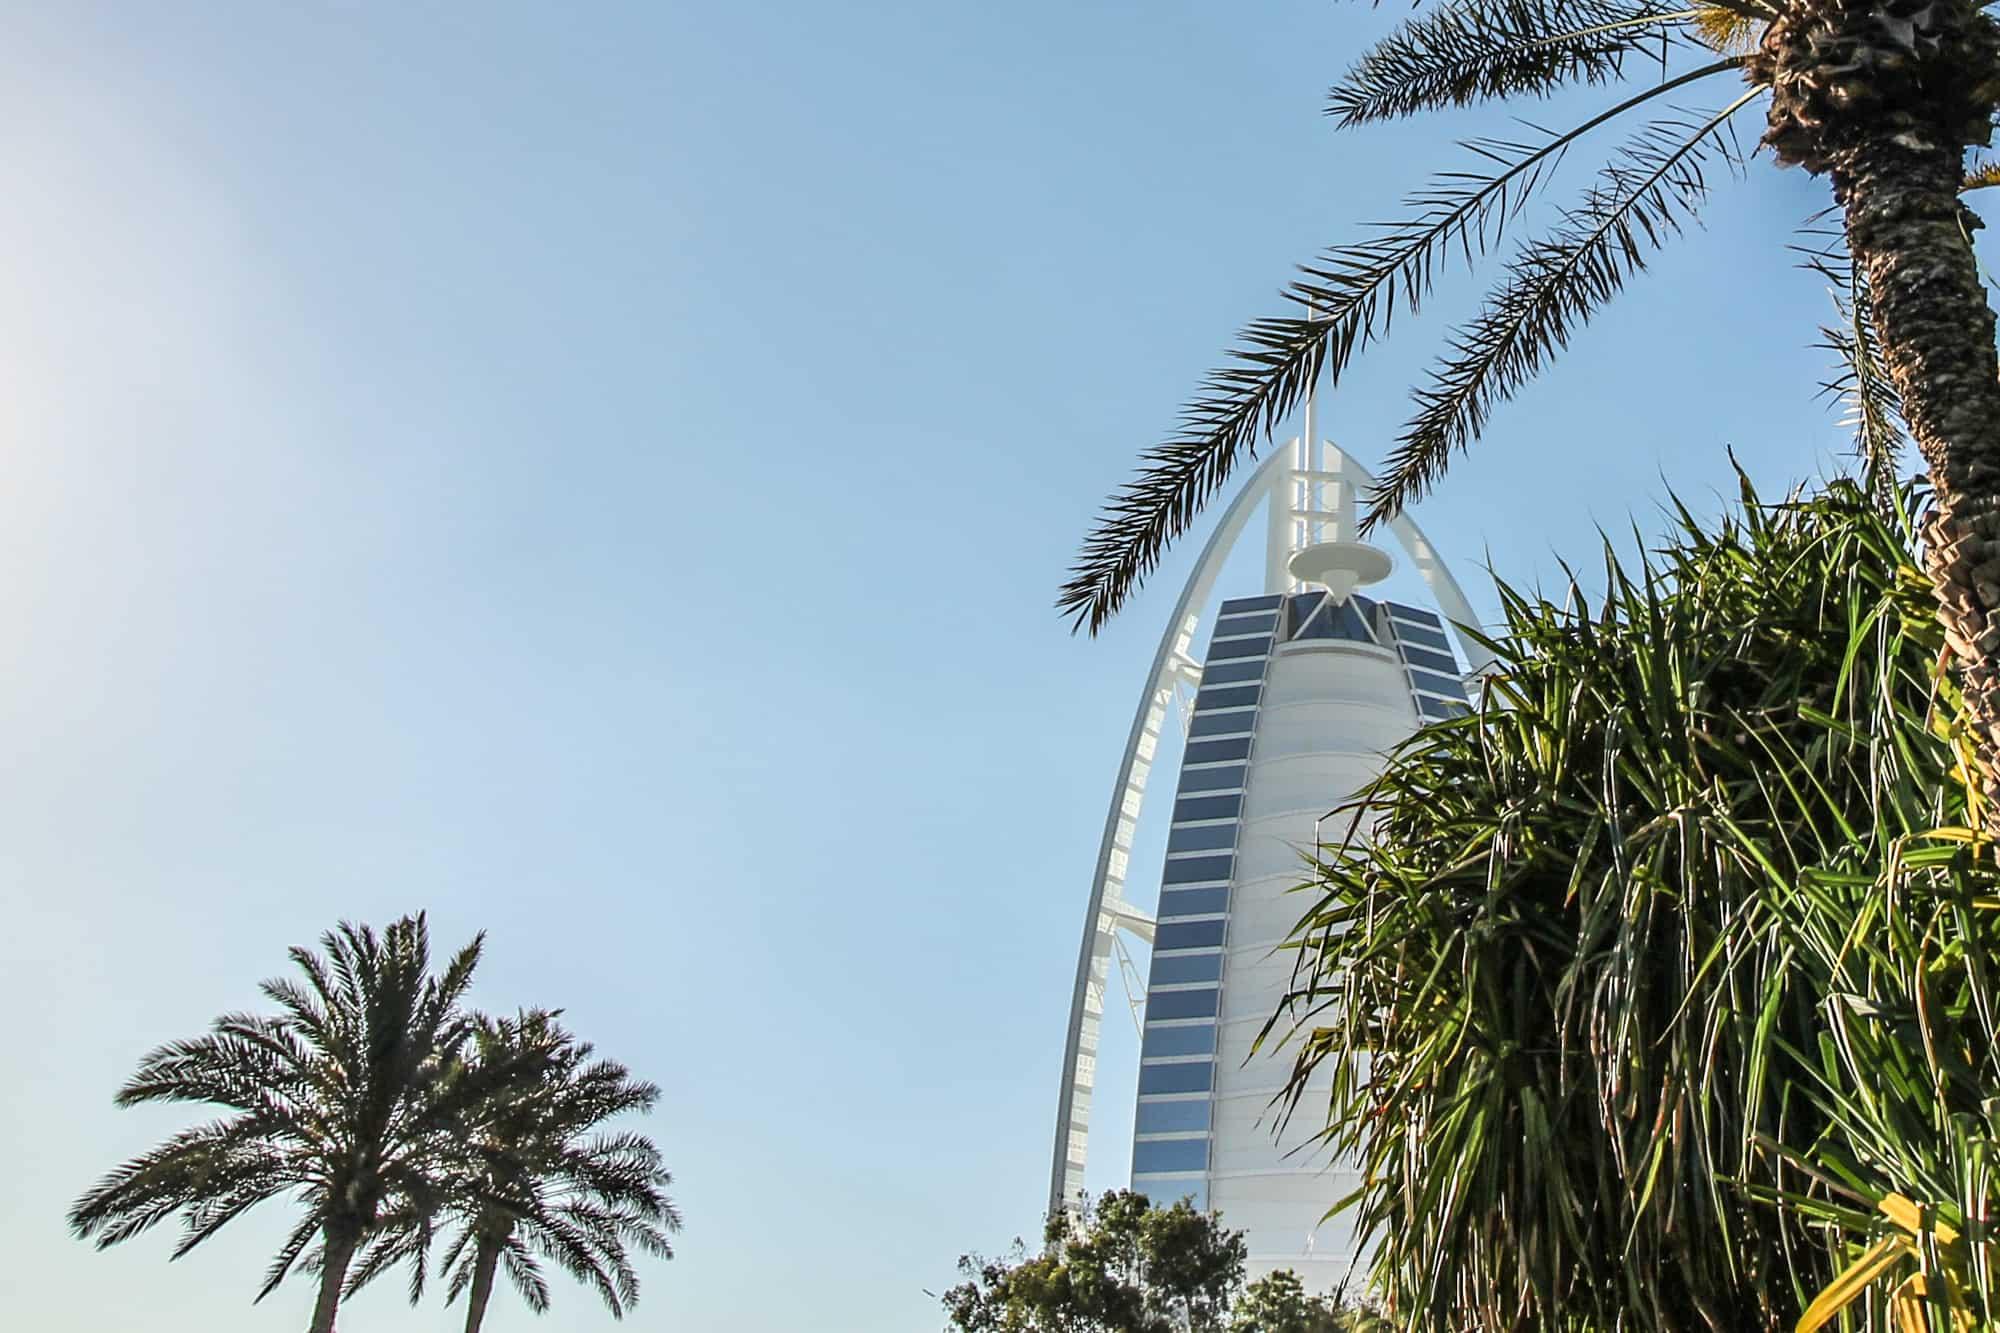 Photo Spots in Dubai – Burj Al Arab